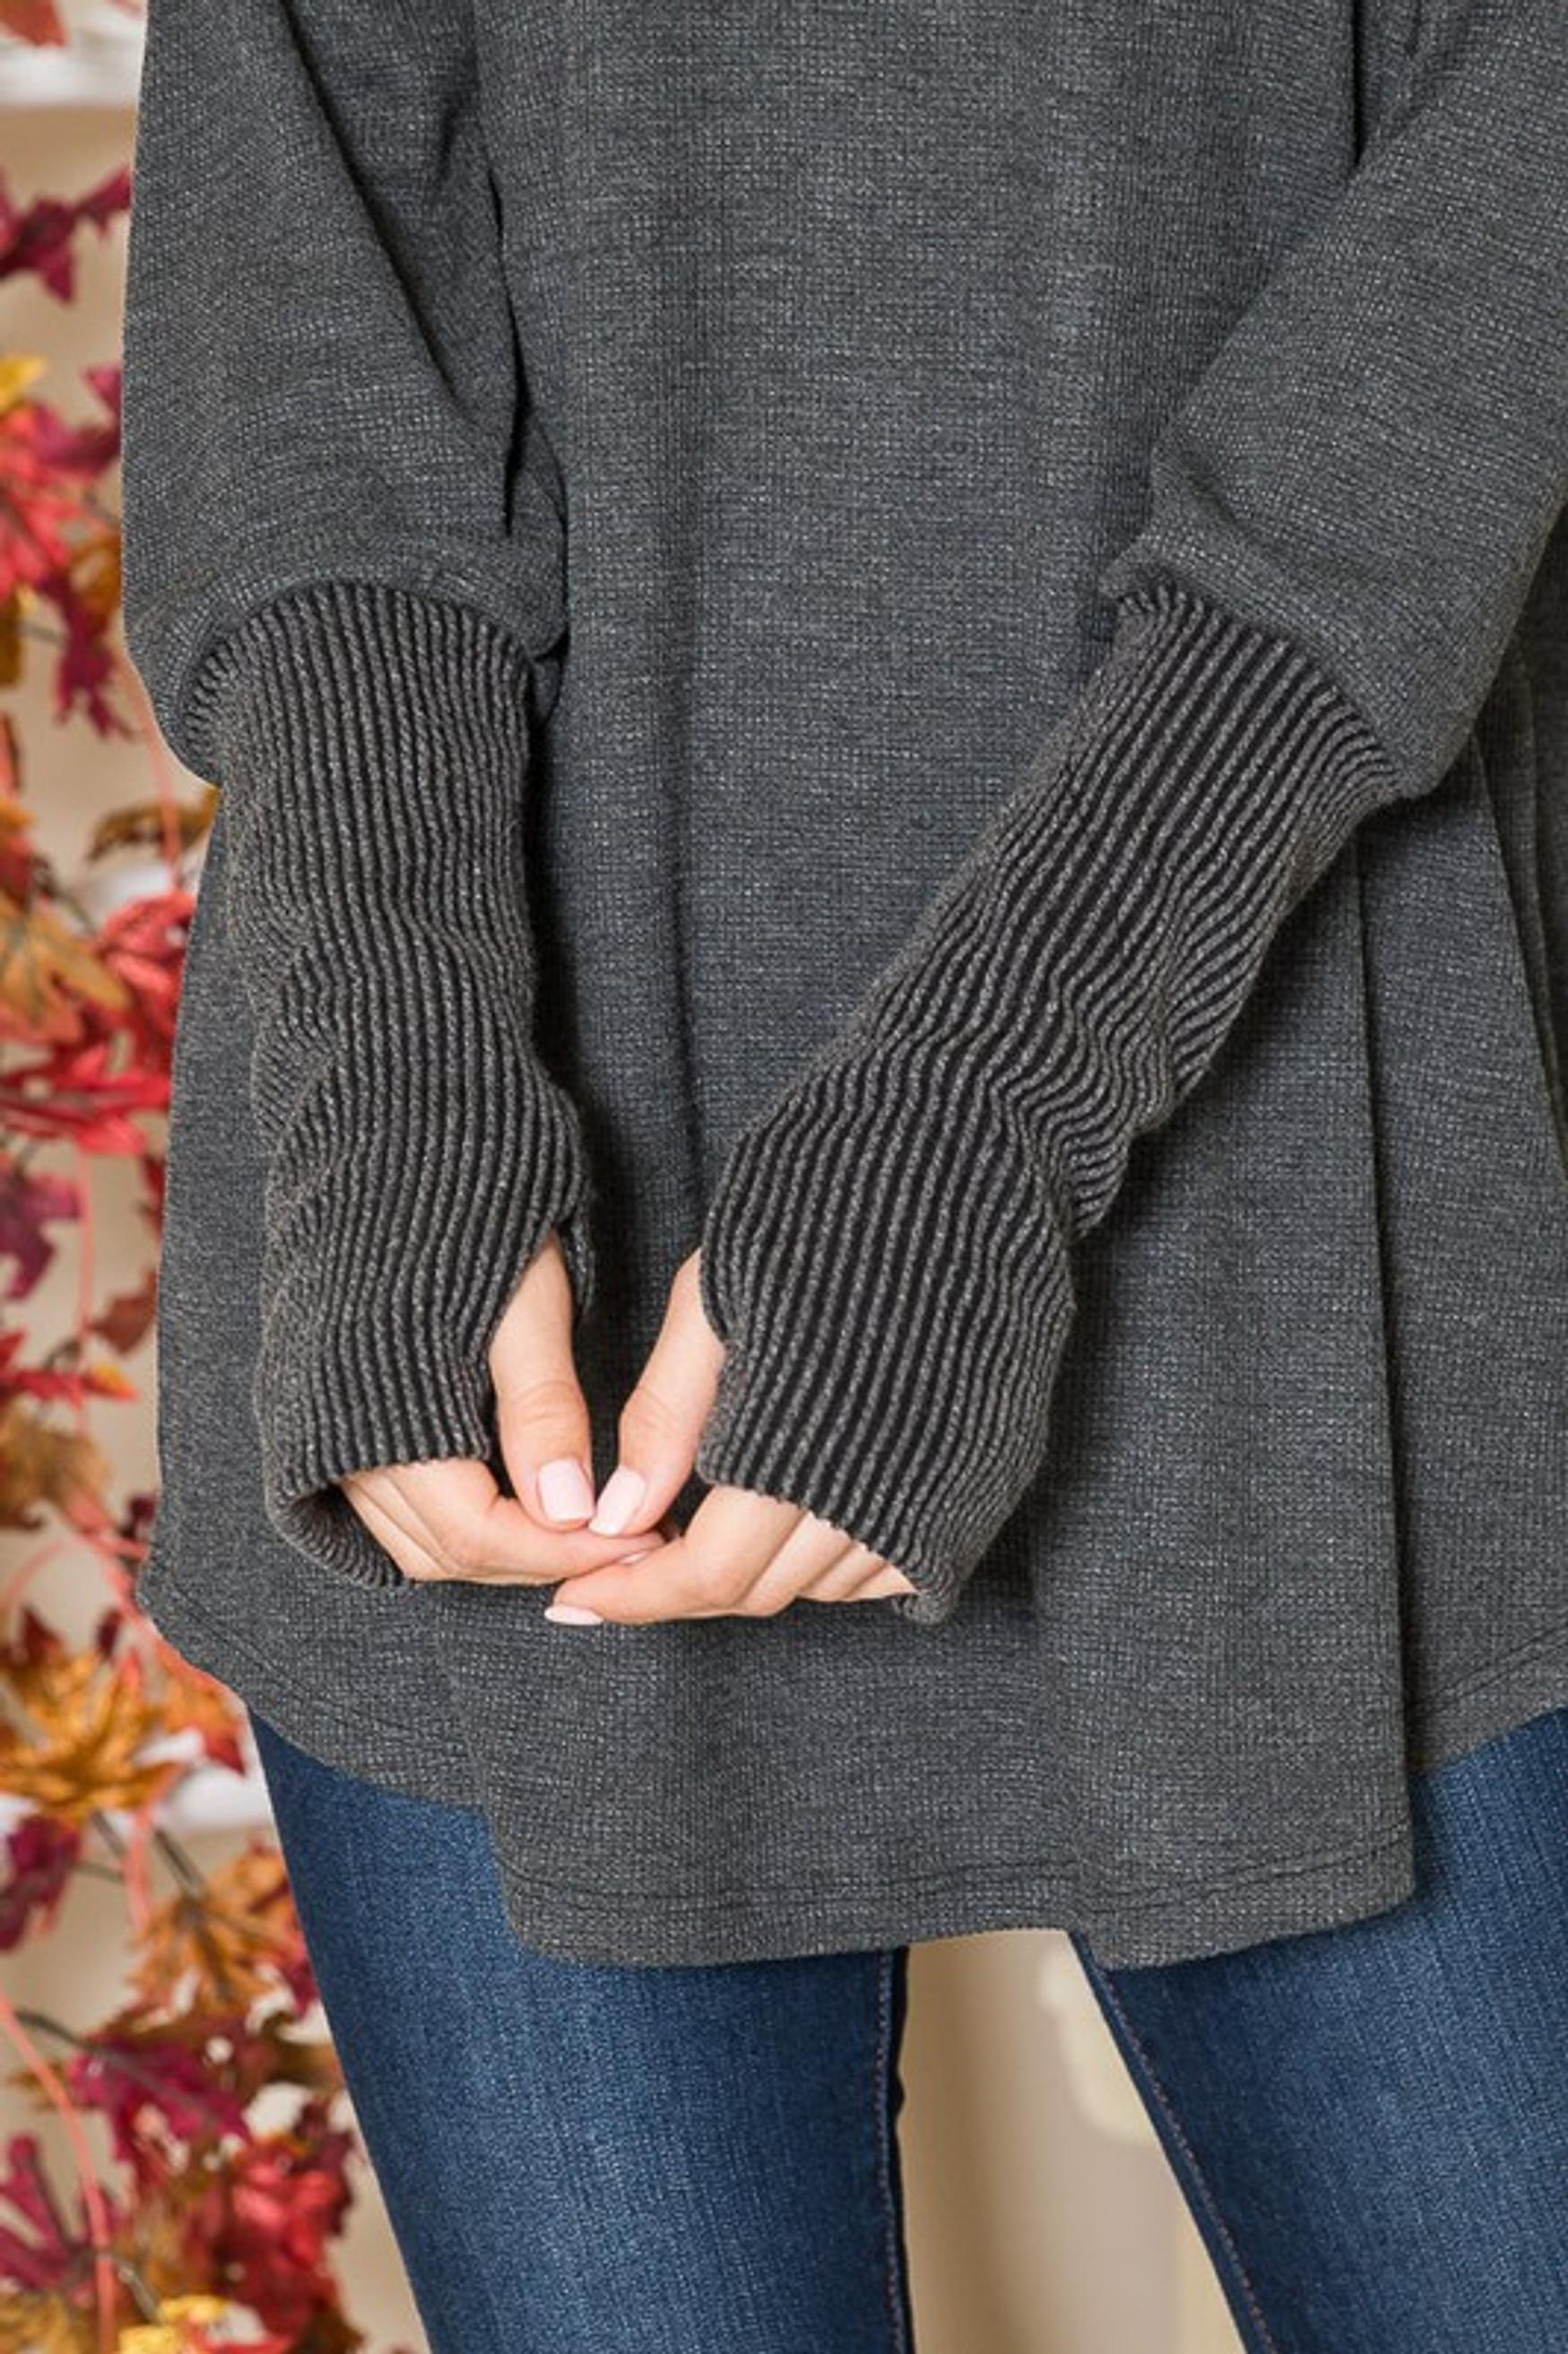 Oversized Ribbed Cuff Long Sleeve Tunic with Thumbholes